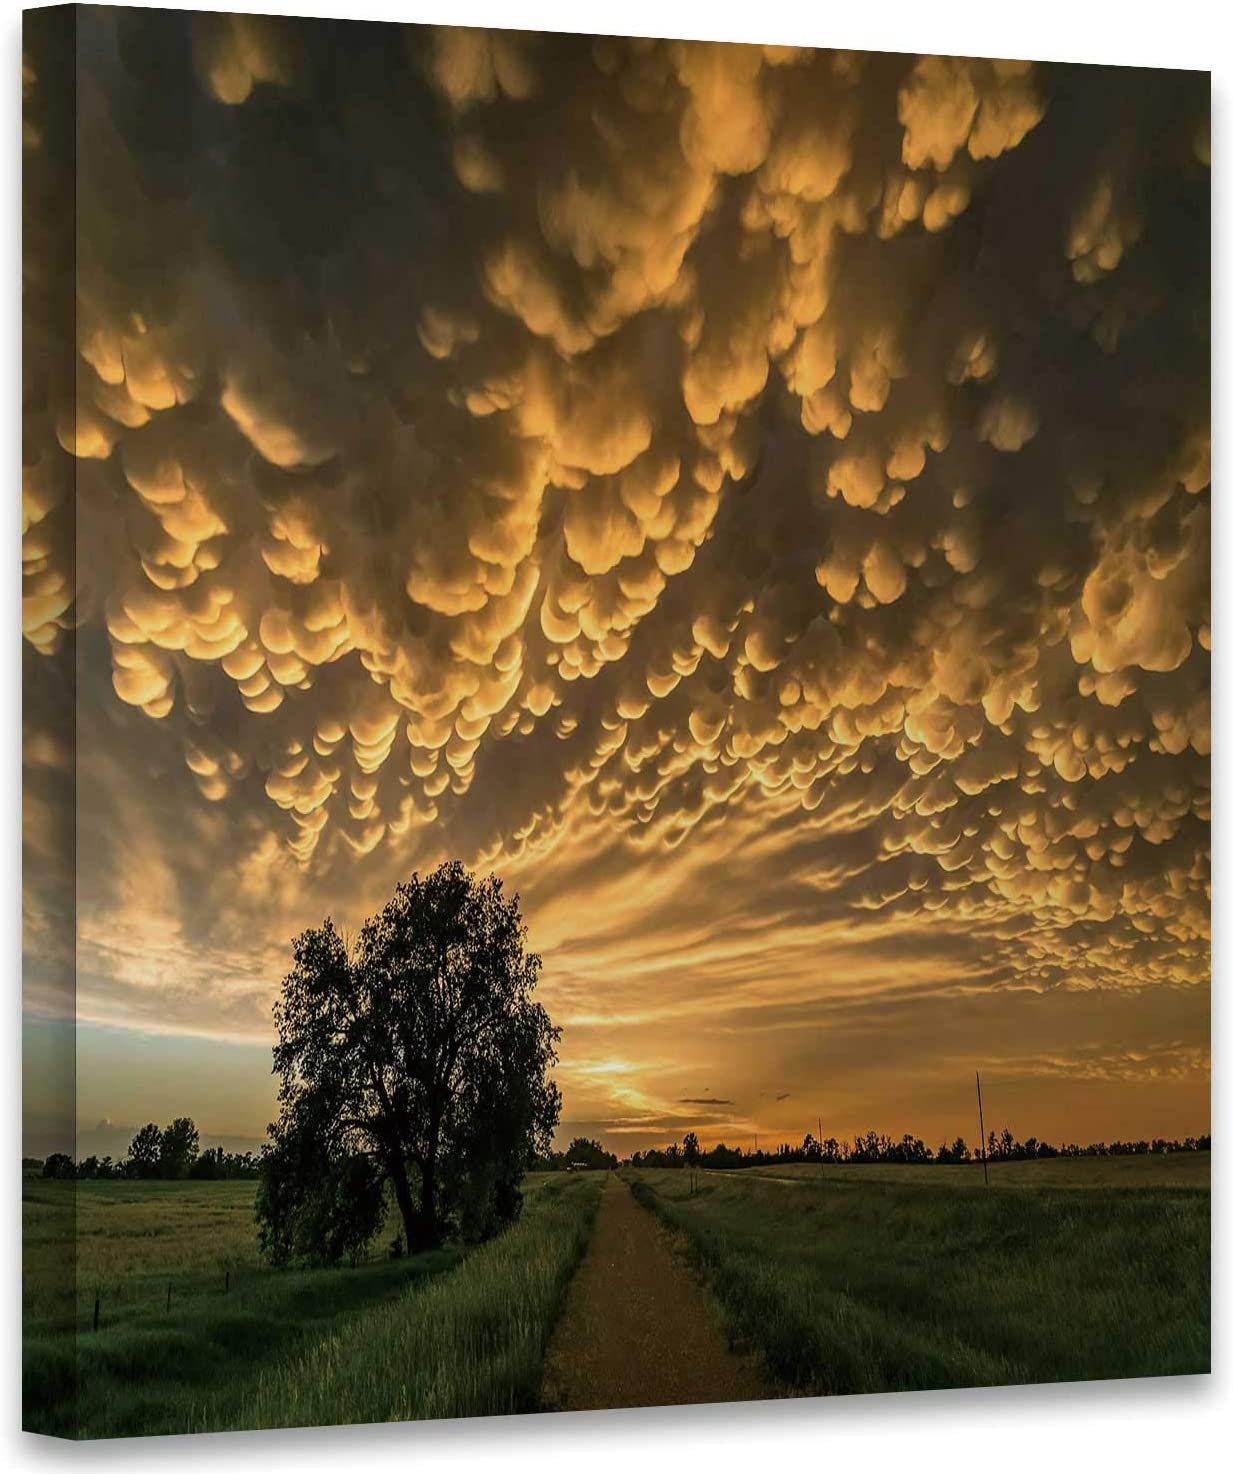 Hitecera Mammatus Clouds at The Back of a Severe Thunderstorm Over Northern Nebraska Nebraska,Bedroom Wall Decor USA Canvas Wall Art for Living Room 1 Panel 12x12